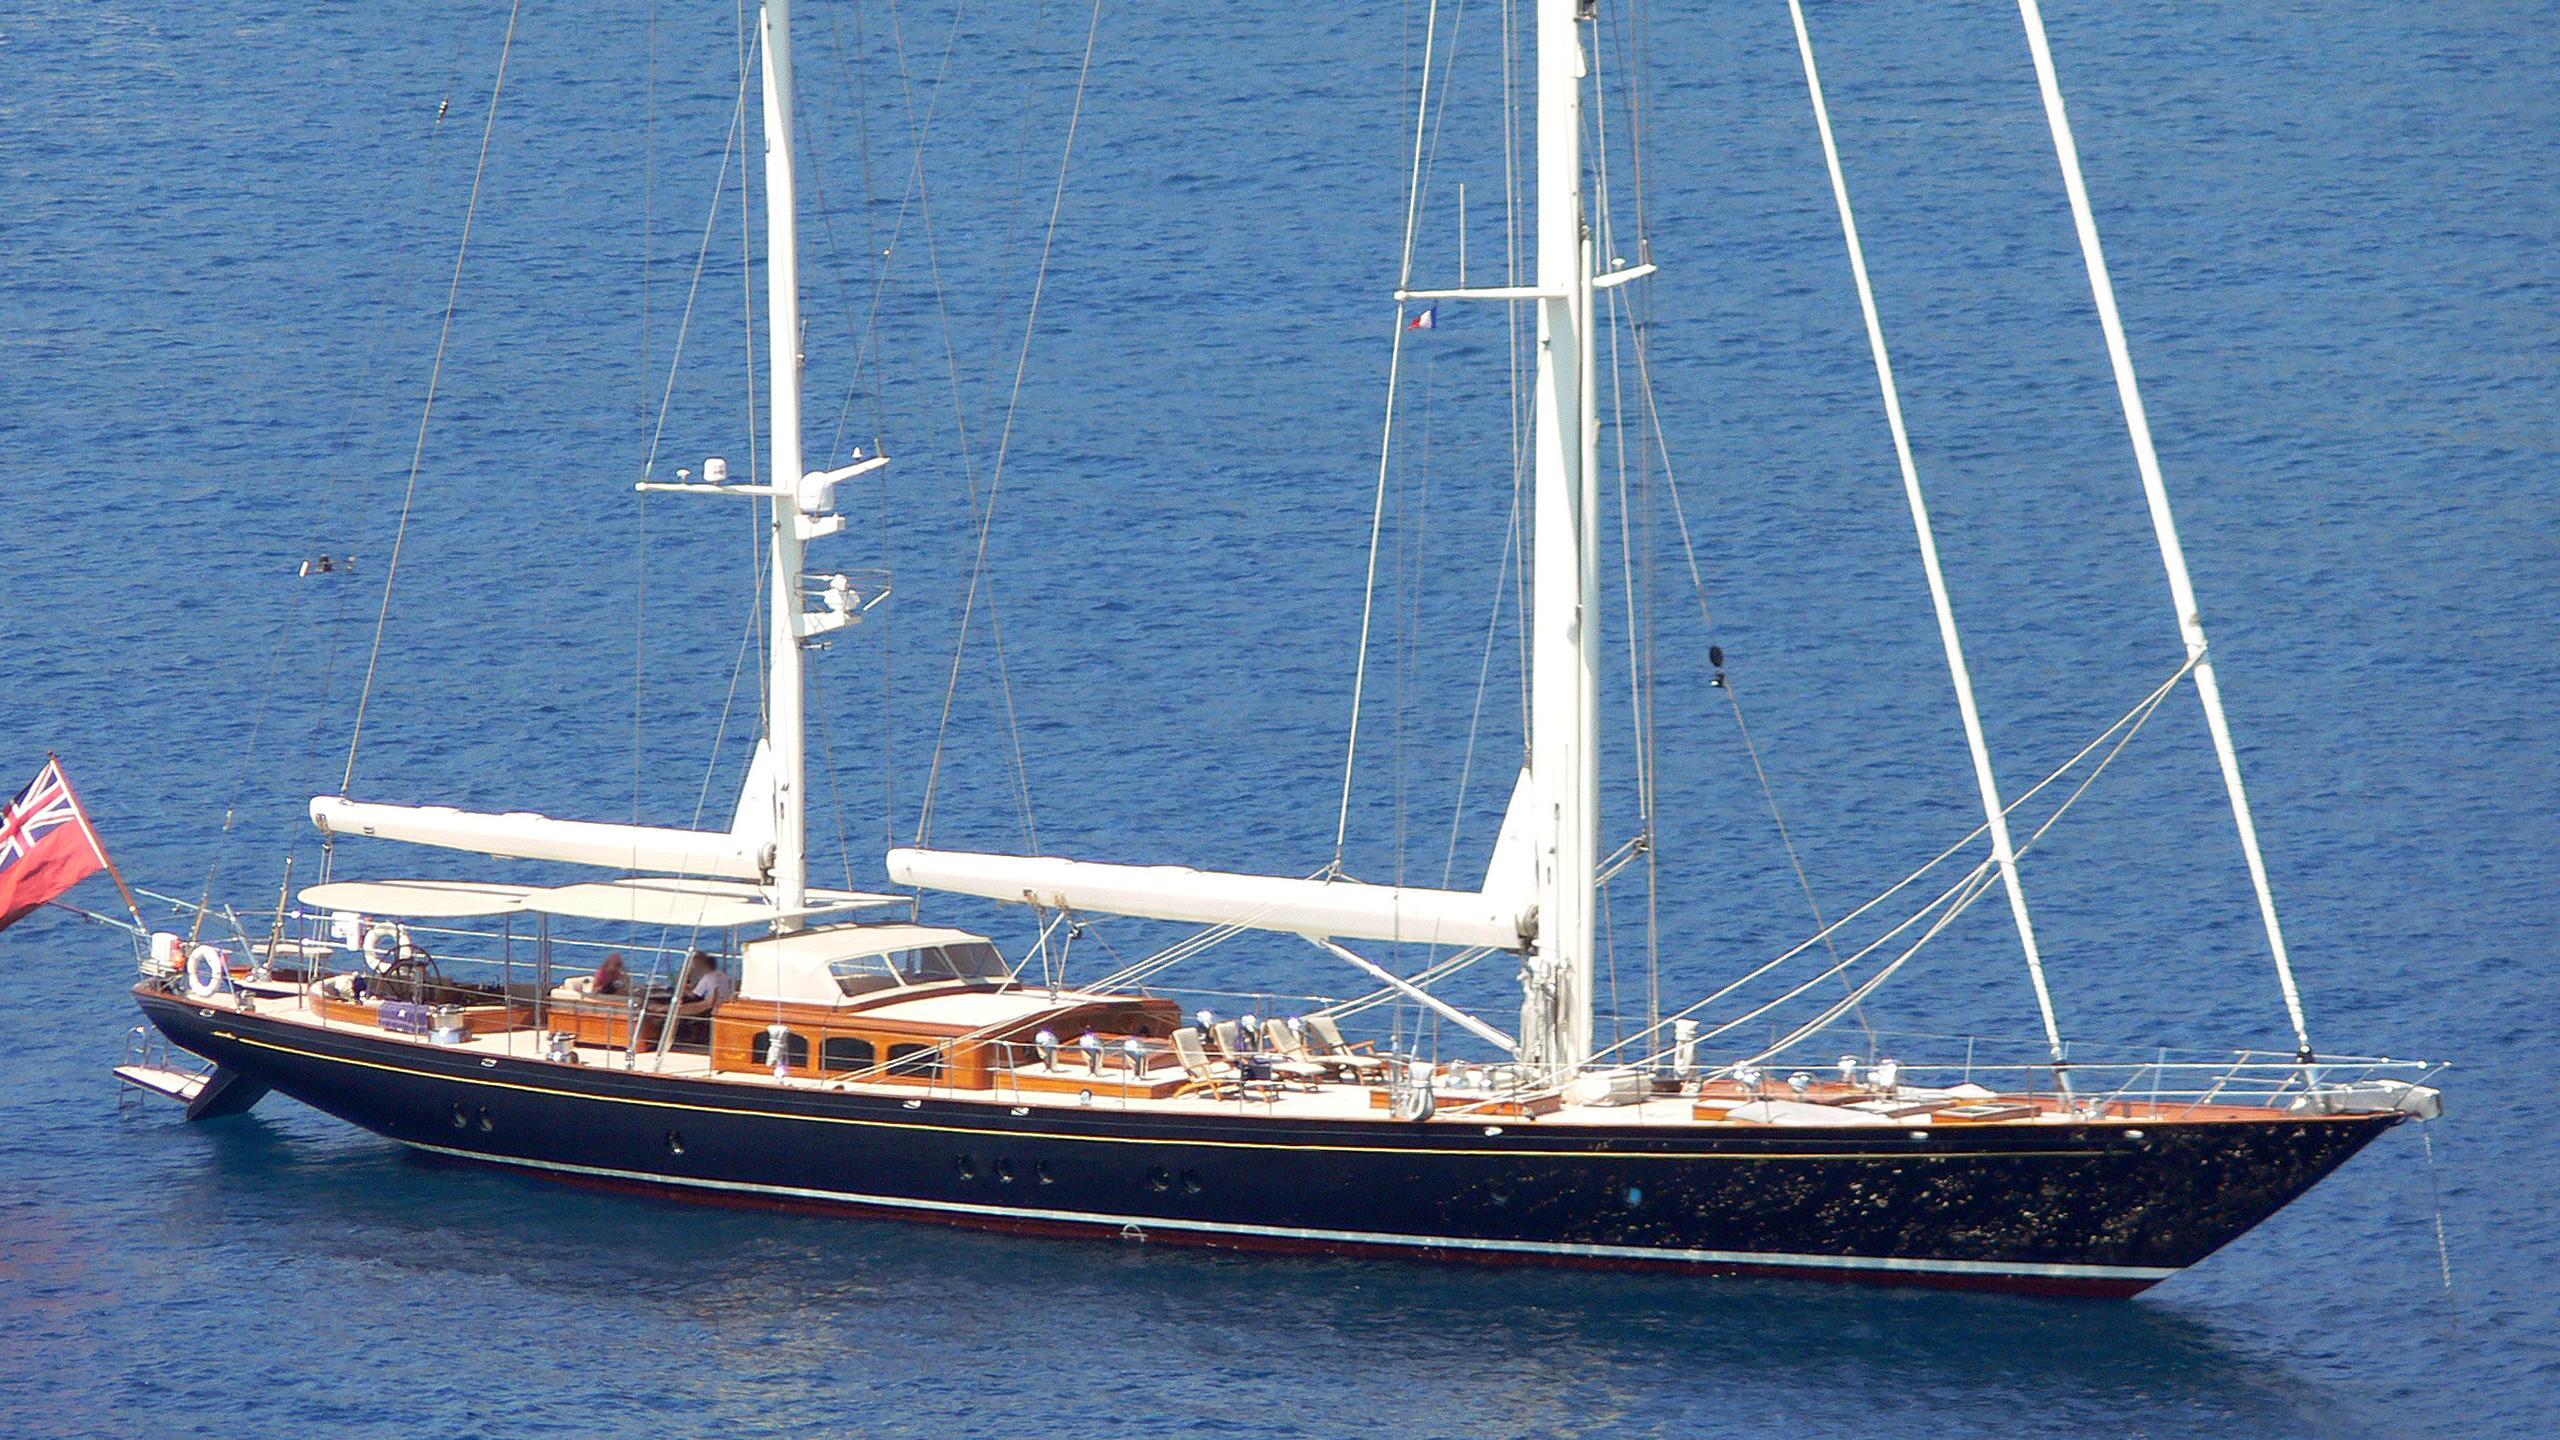 huckleberry-sailing-yacht-alloy-2001-40m-aerial